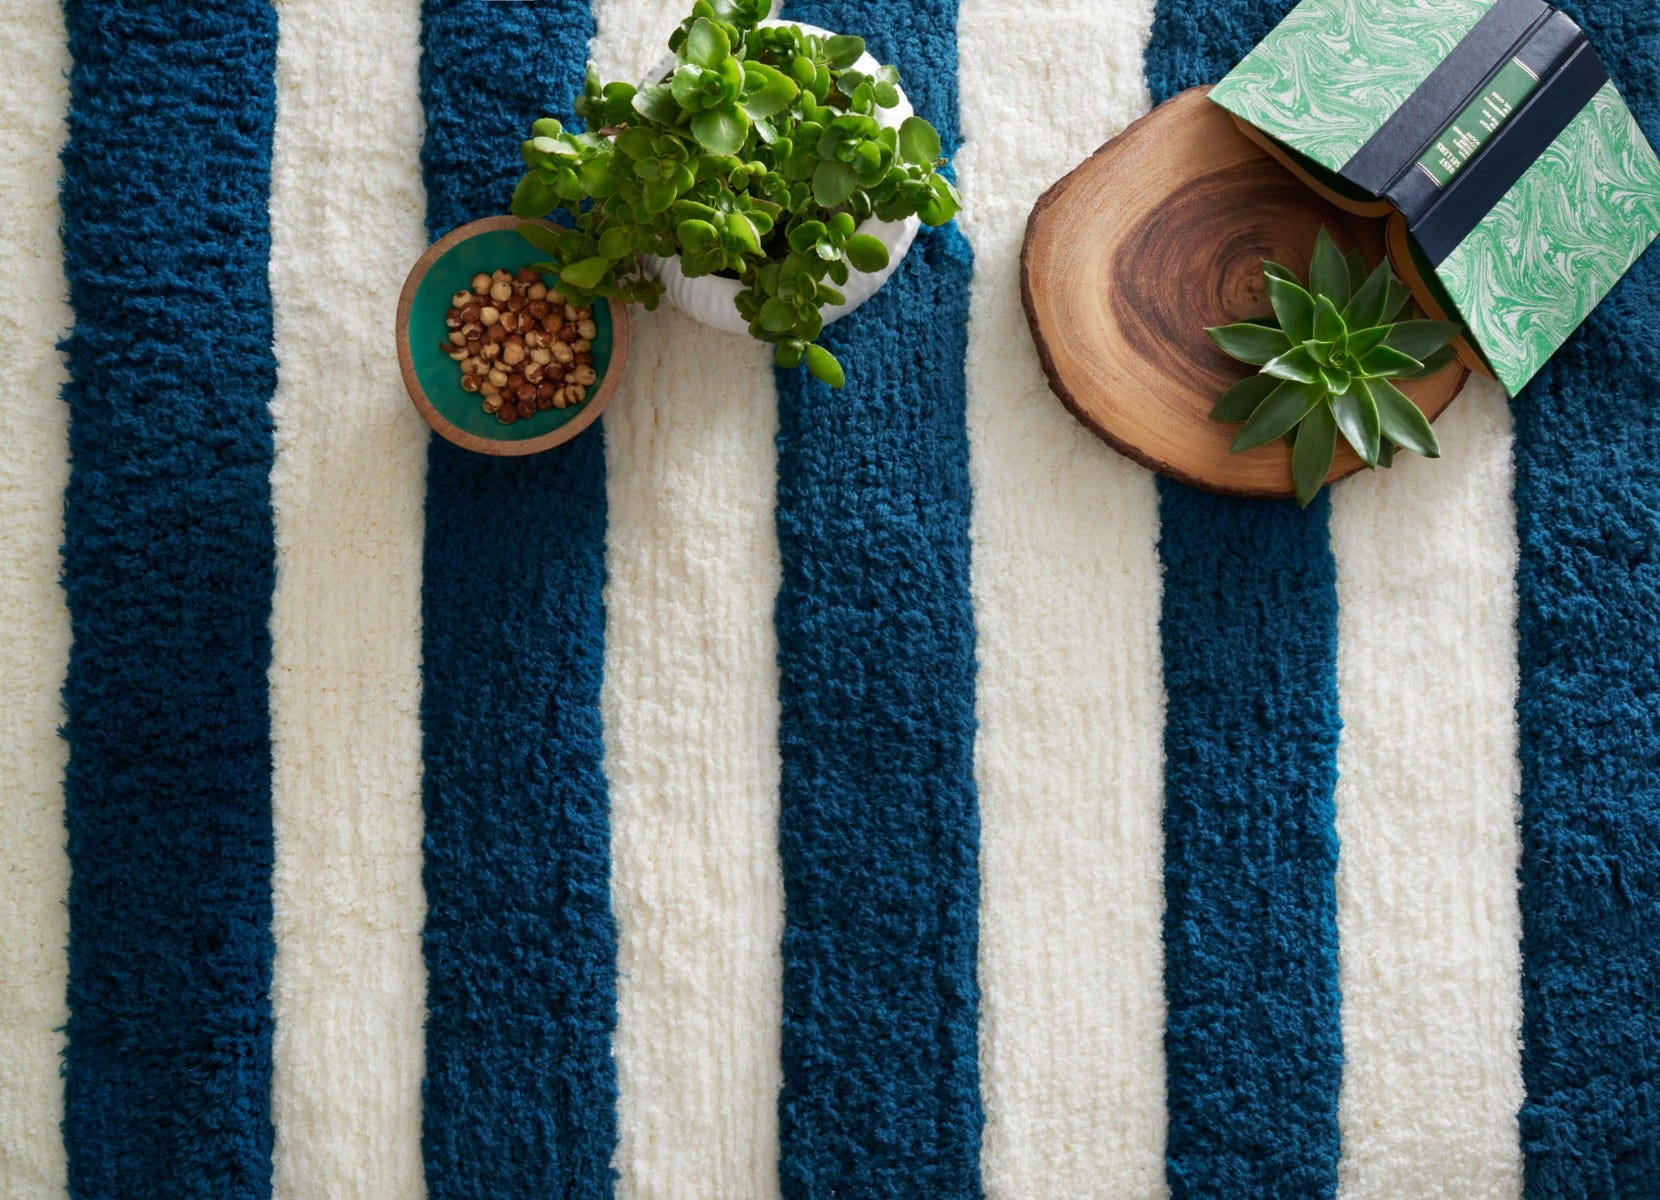 Blue Striped Area Rug